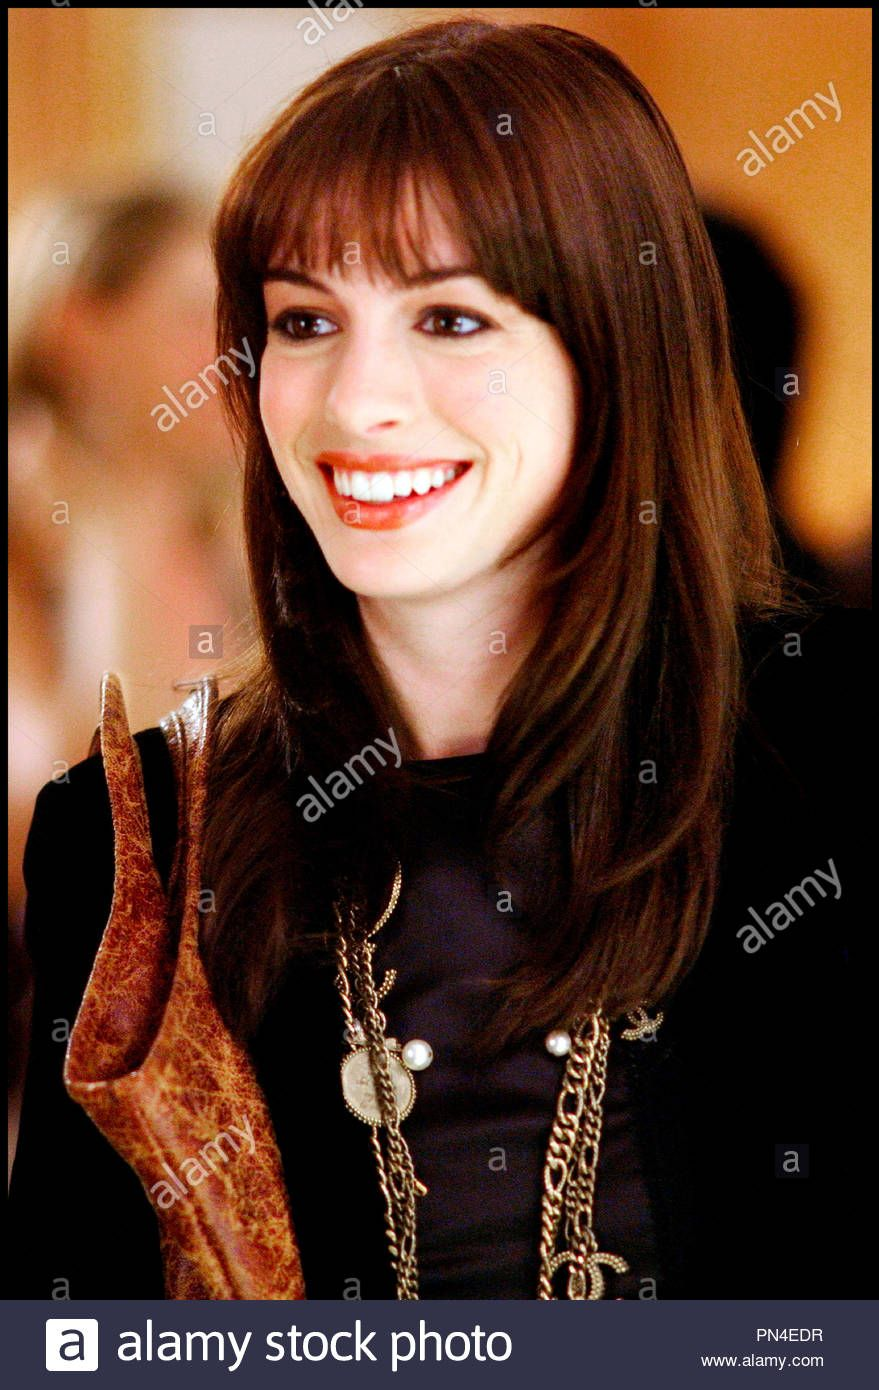 Anne Hathaway Le Diable S Habille En Prada : hathaway, diable, habille, prada, Style